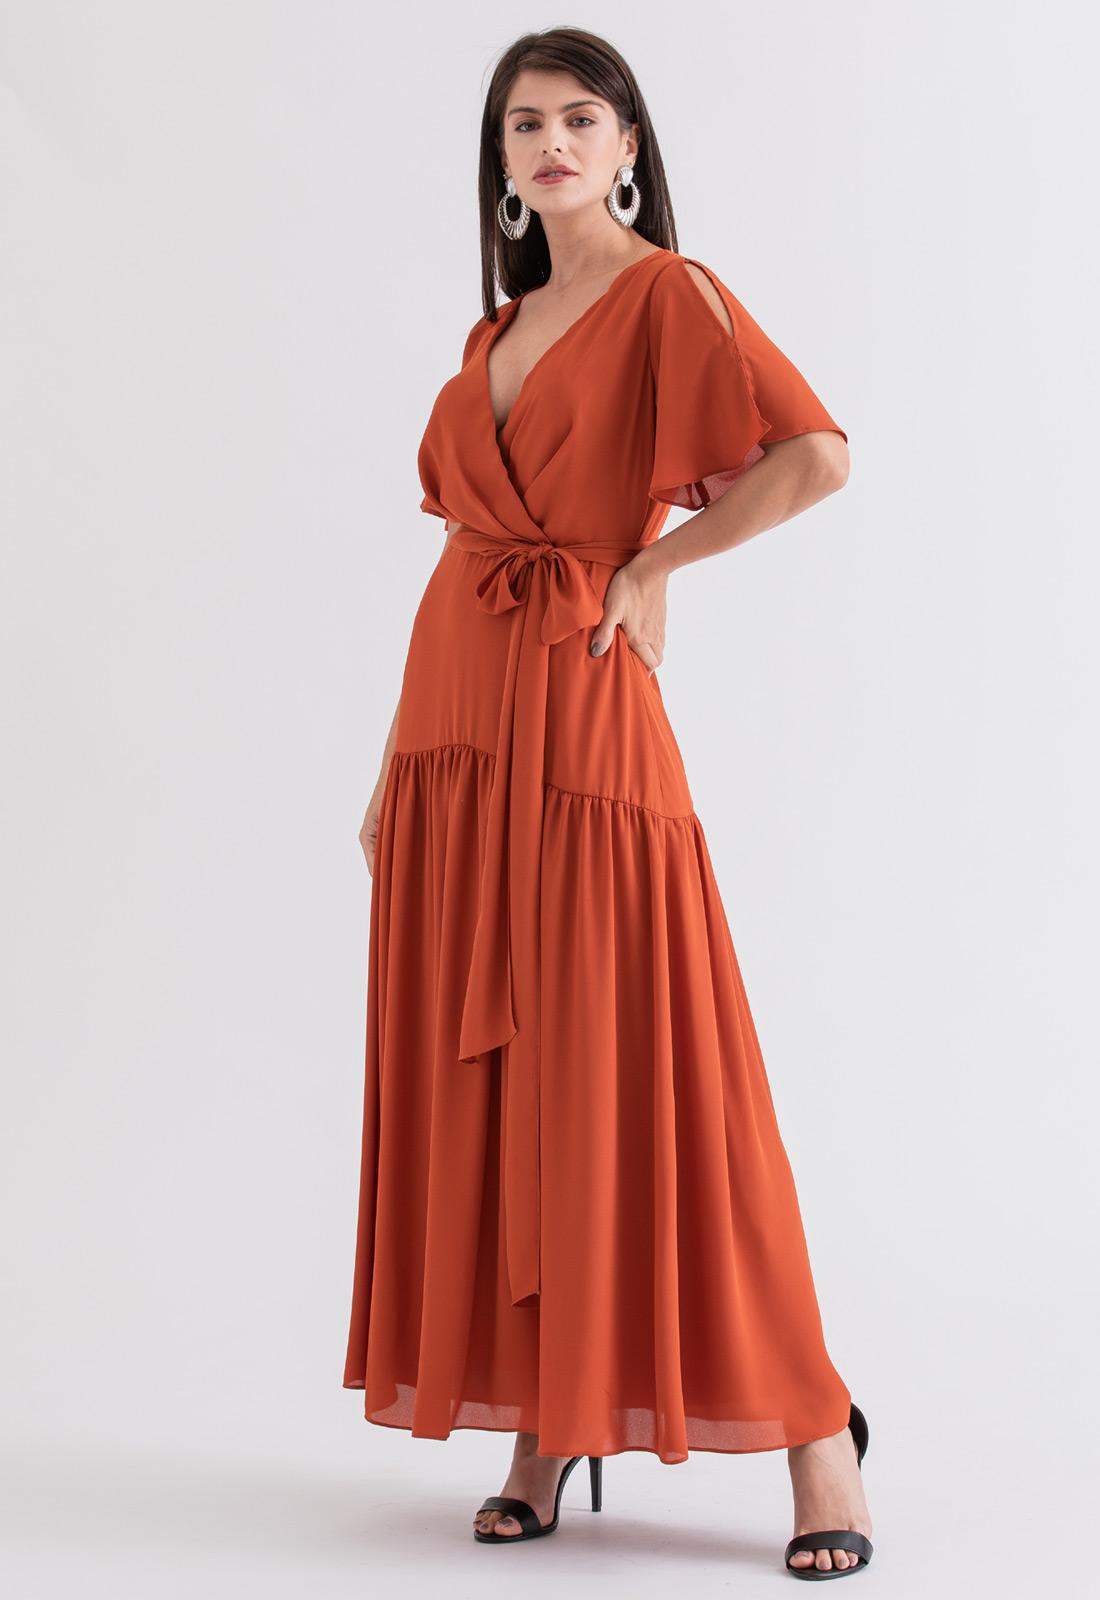 Vestido de festa maxi terracota ref. 2695